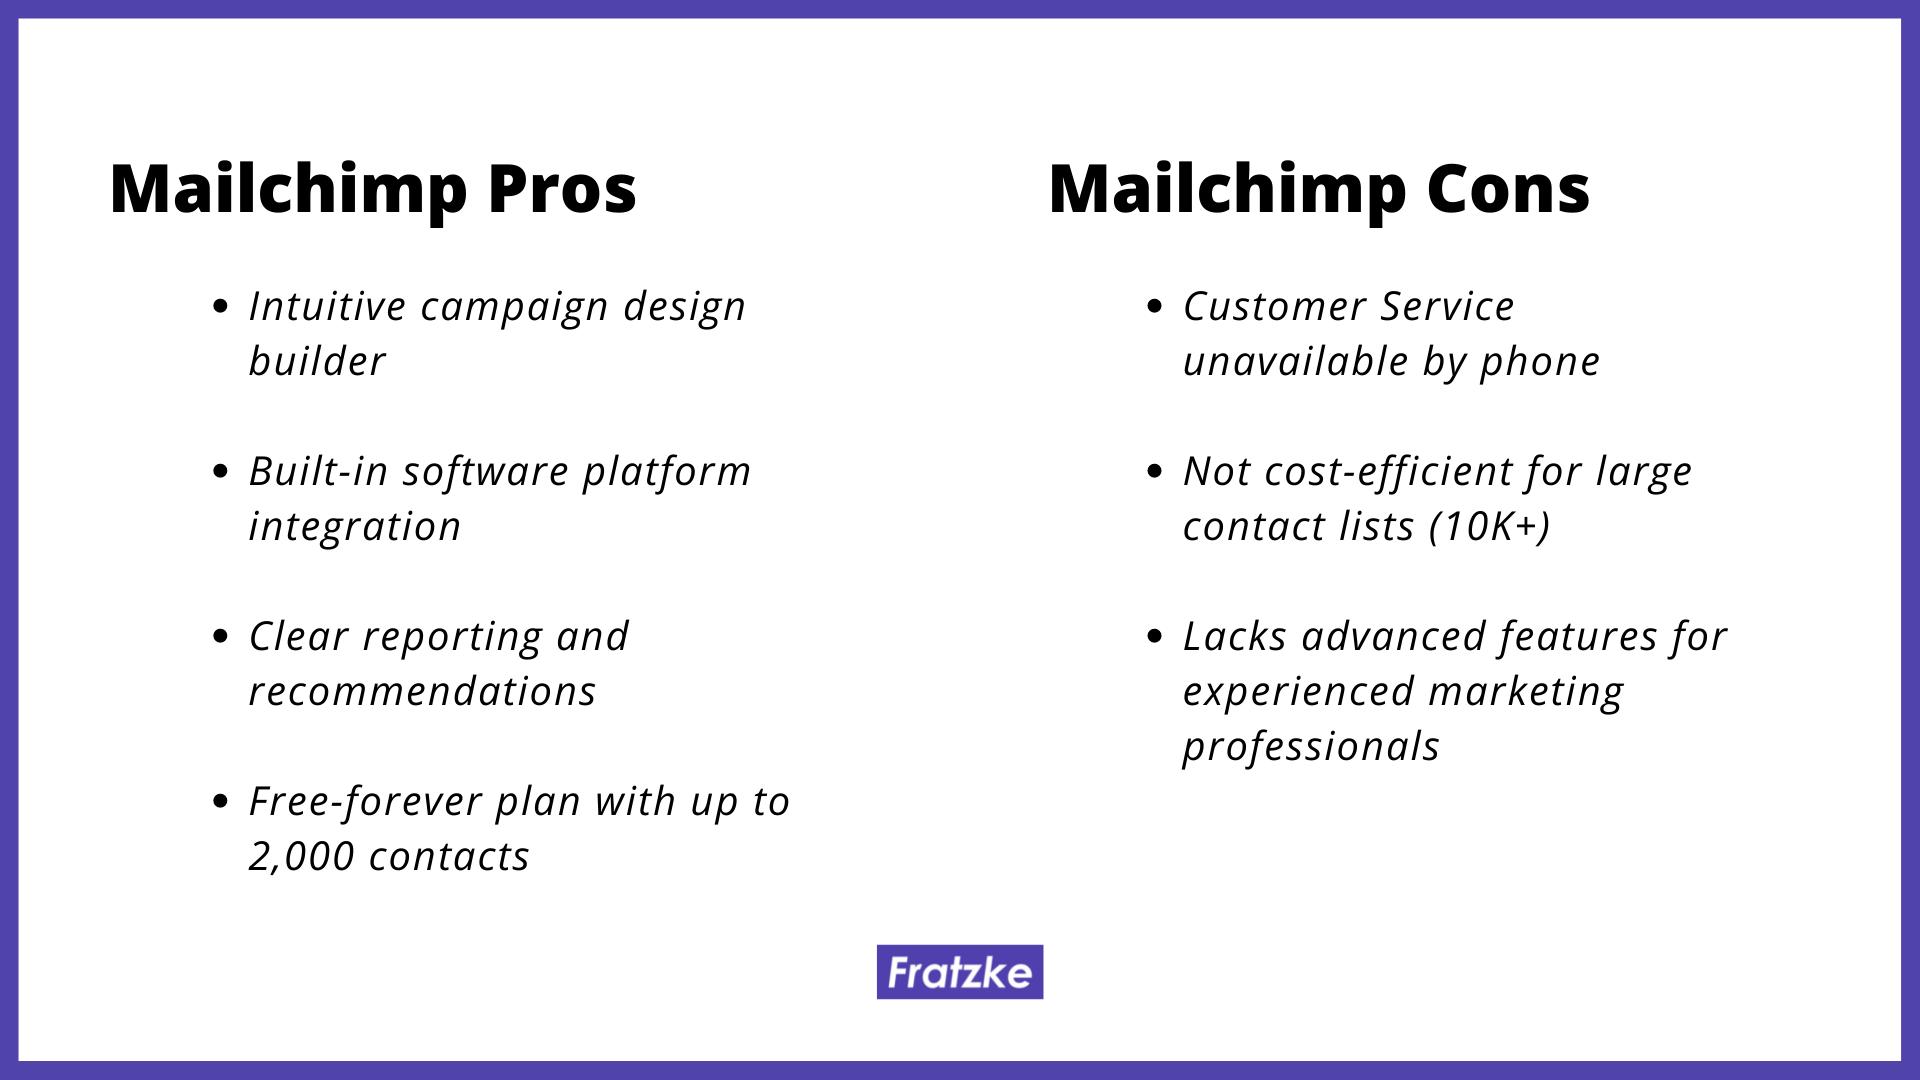 Mailchimp pros and cons by Fratzke